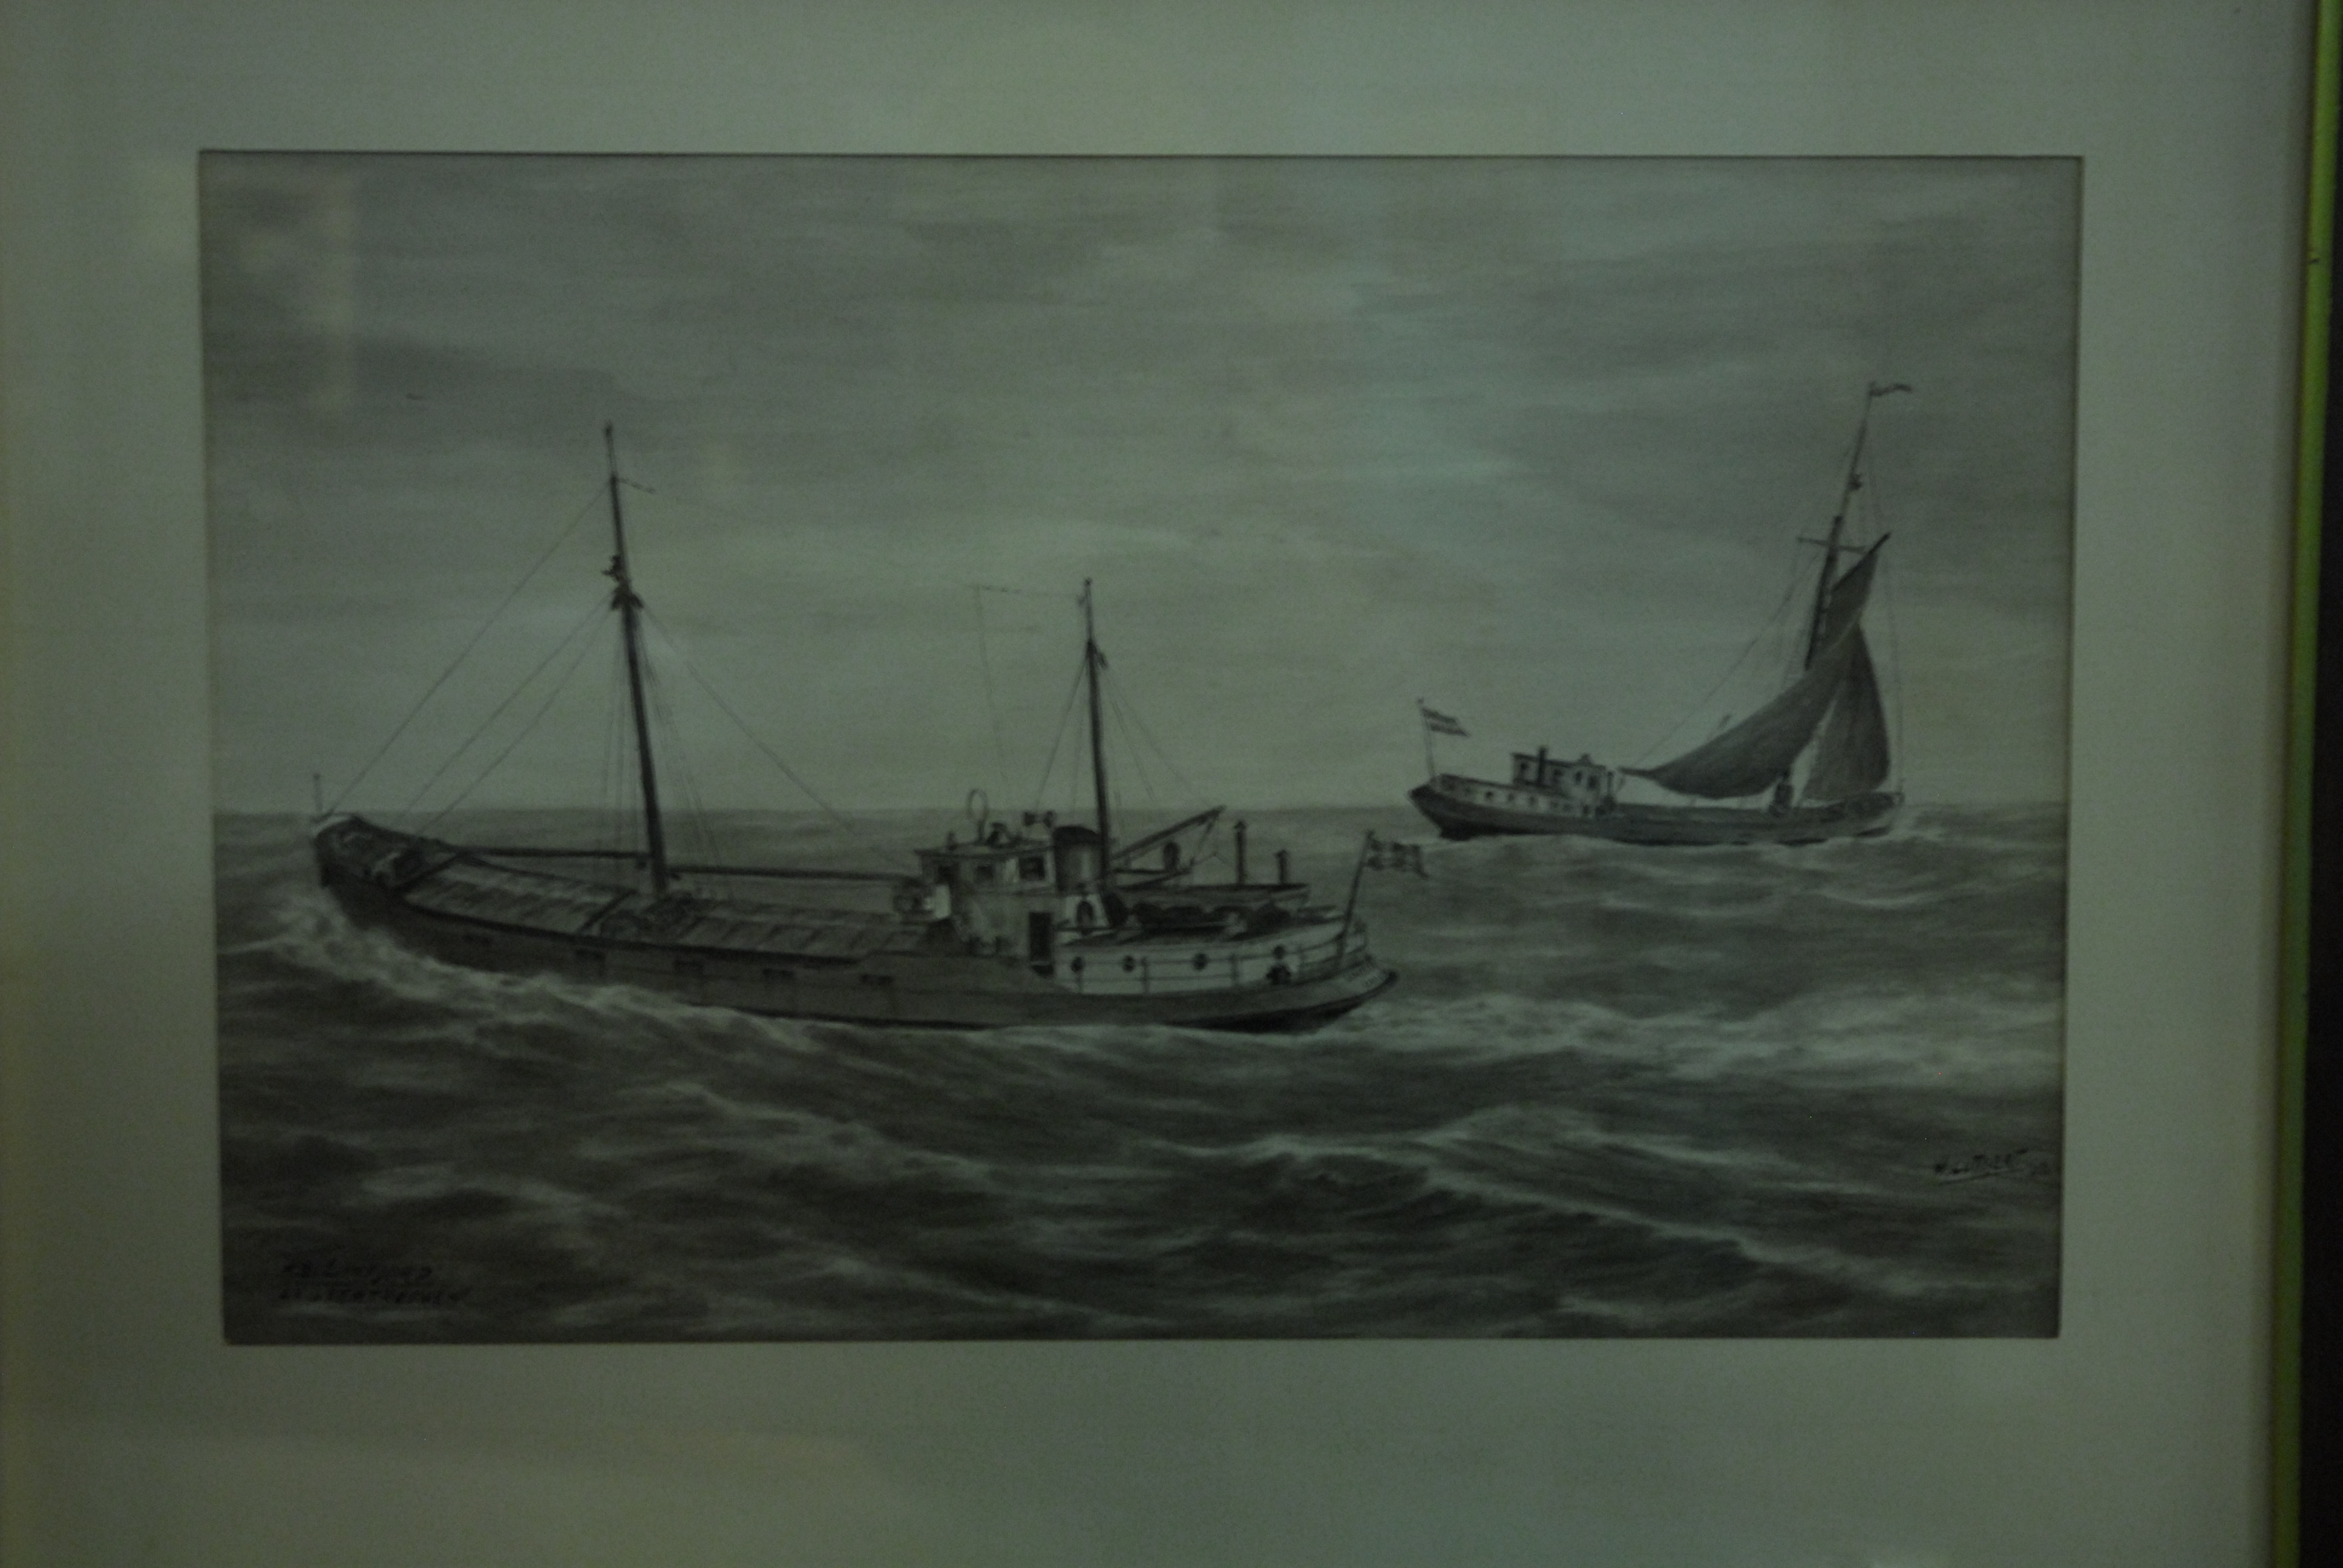 pentekening van 'Limfjord' en ex 'Vetrouwen'